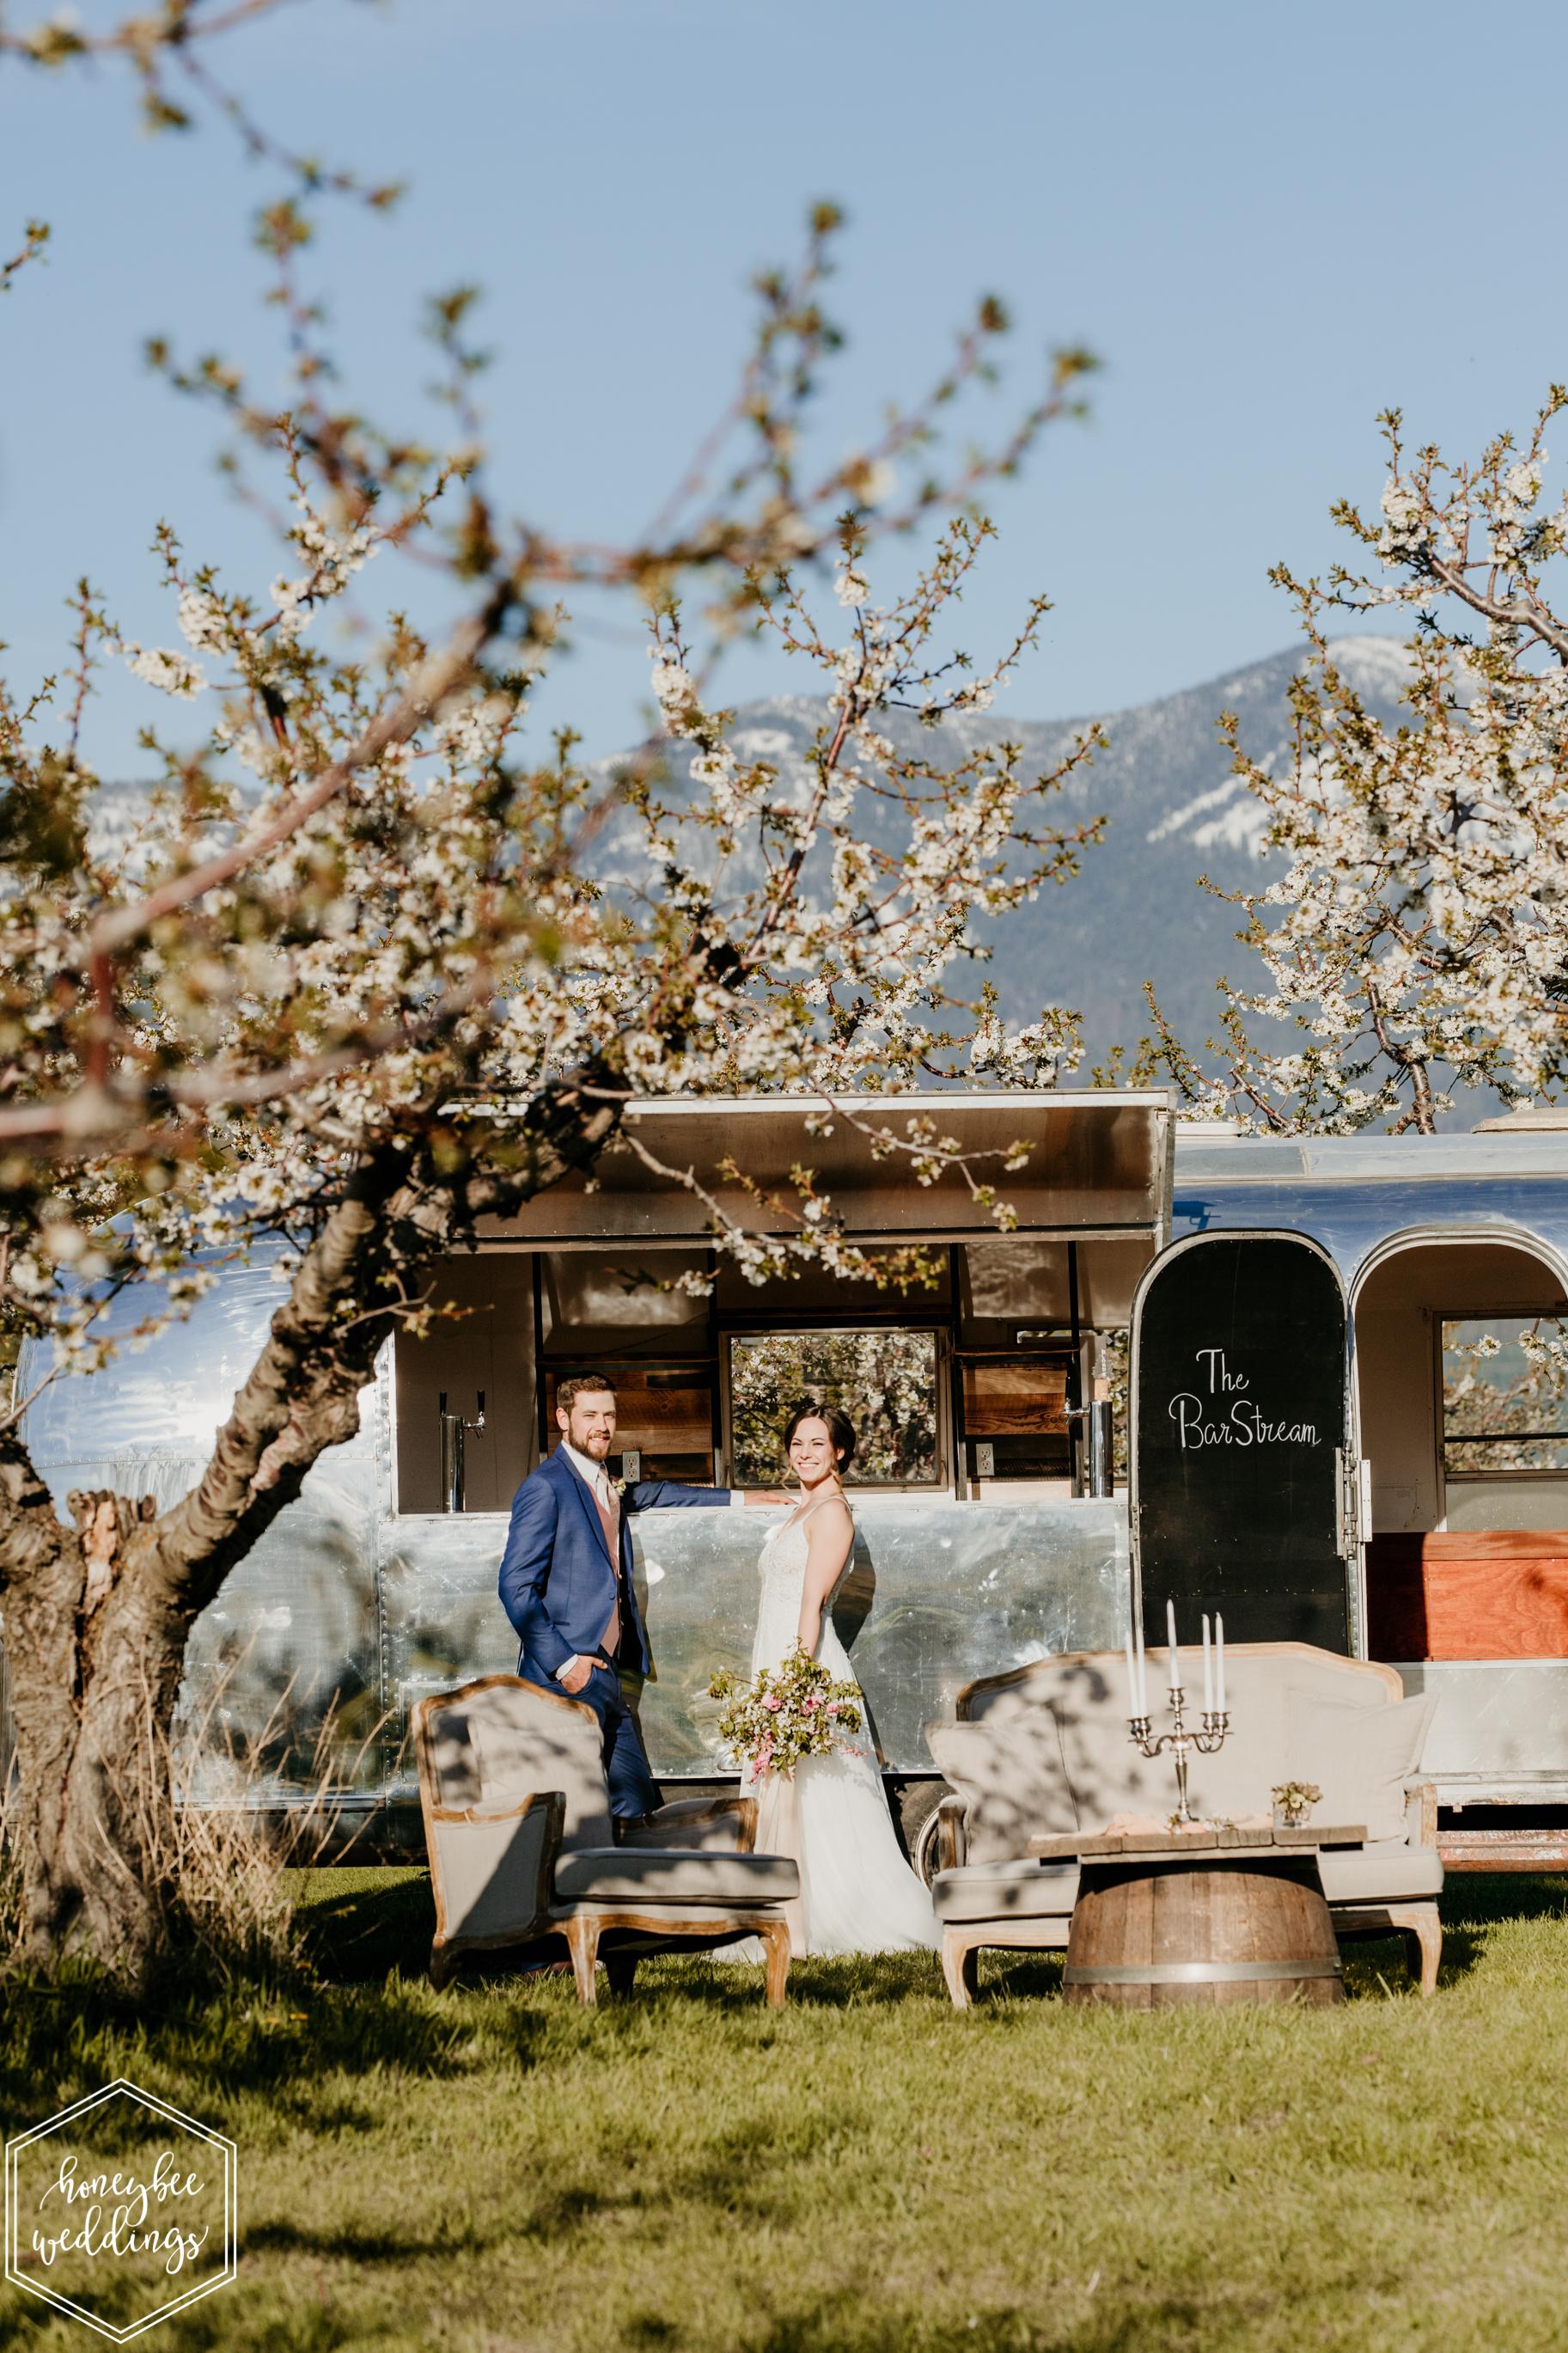 078Cherry Blossom Wedding_Styled Photoshoot_Honeybee Weddings_May 11, 2019-524.jpg